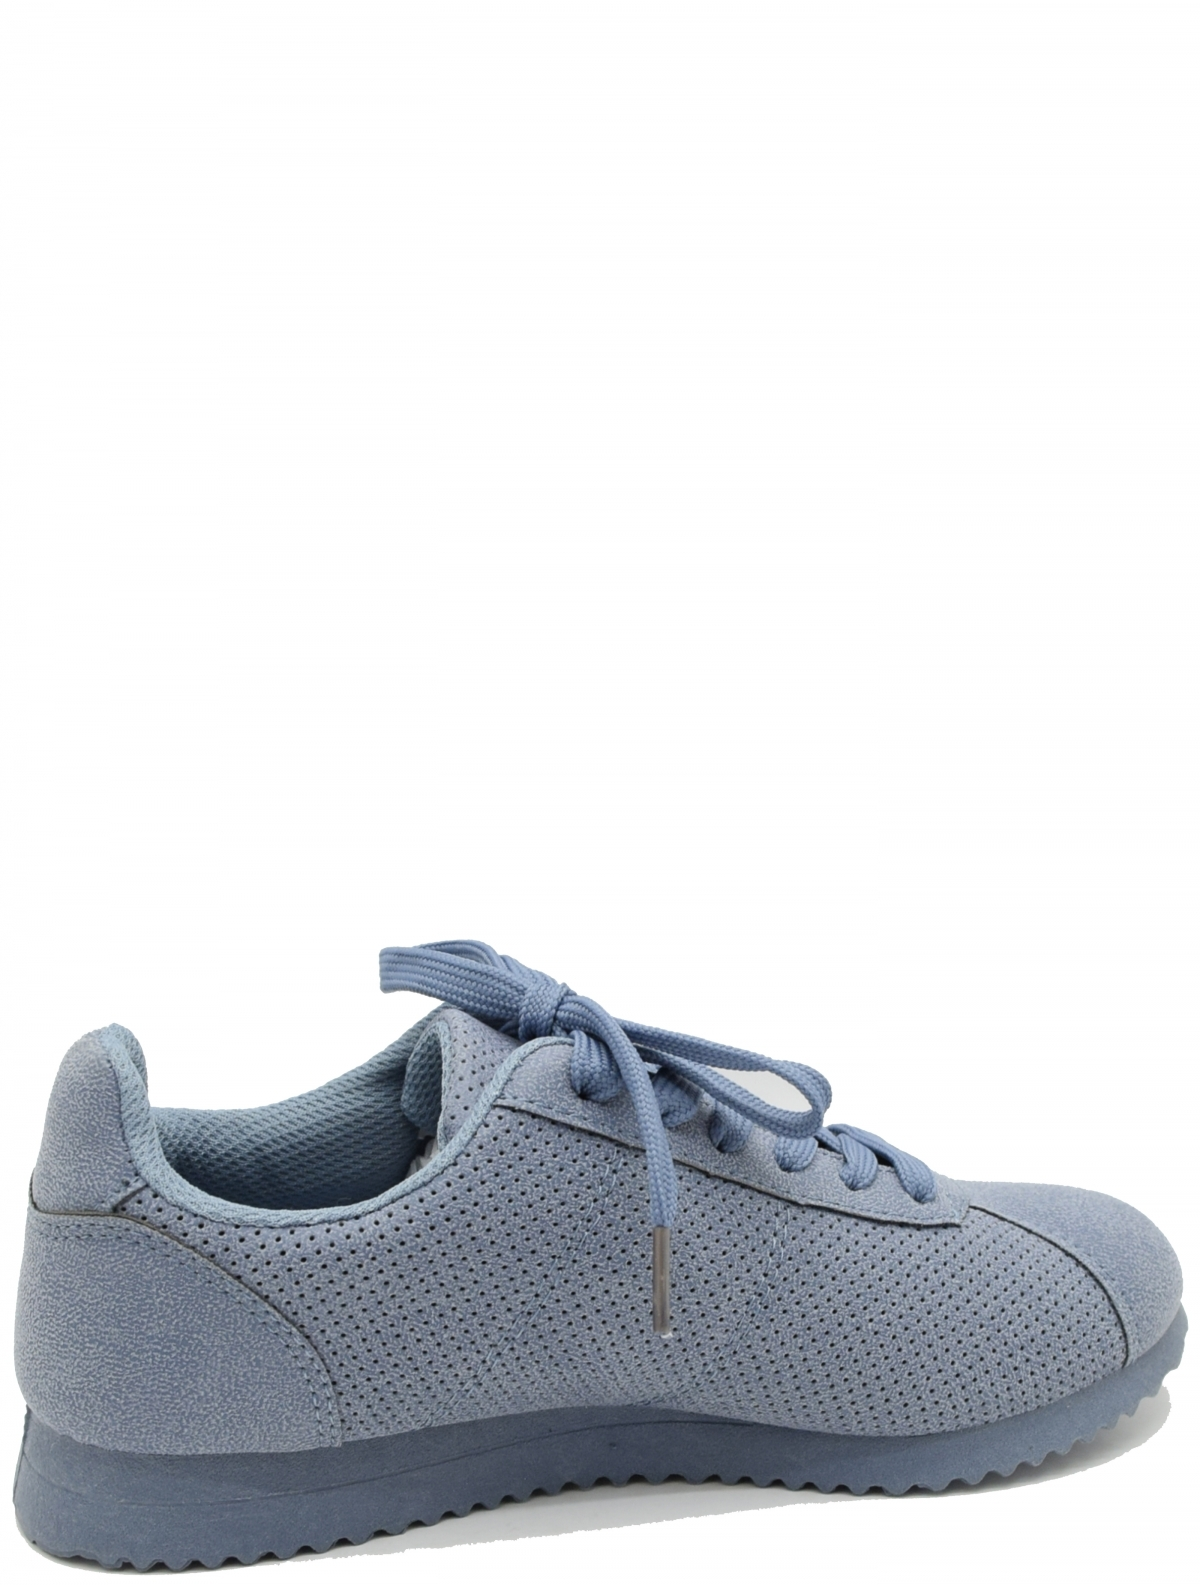 Trien 17SCF-JL001-14 женские кроссовки